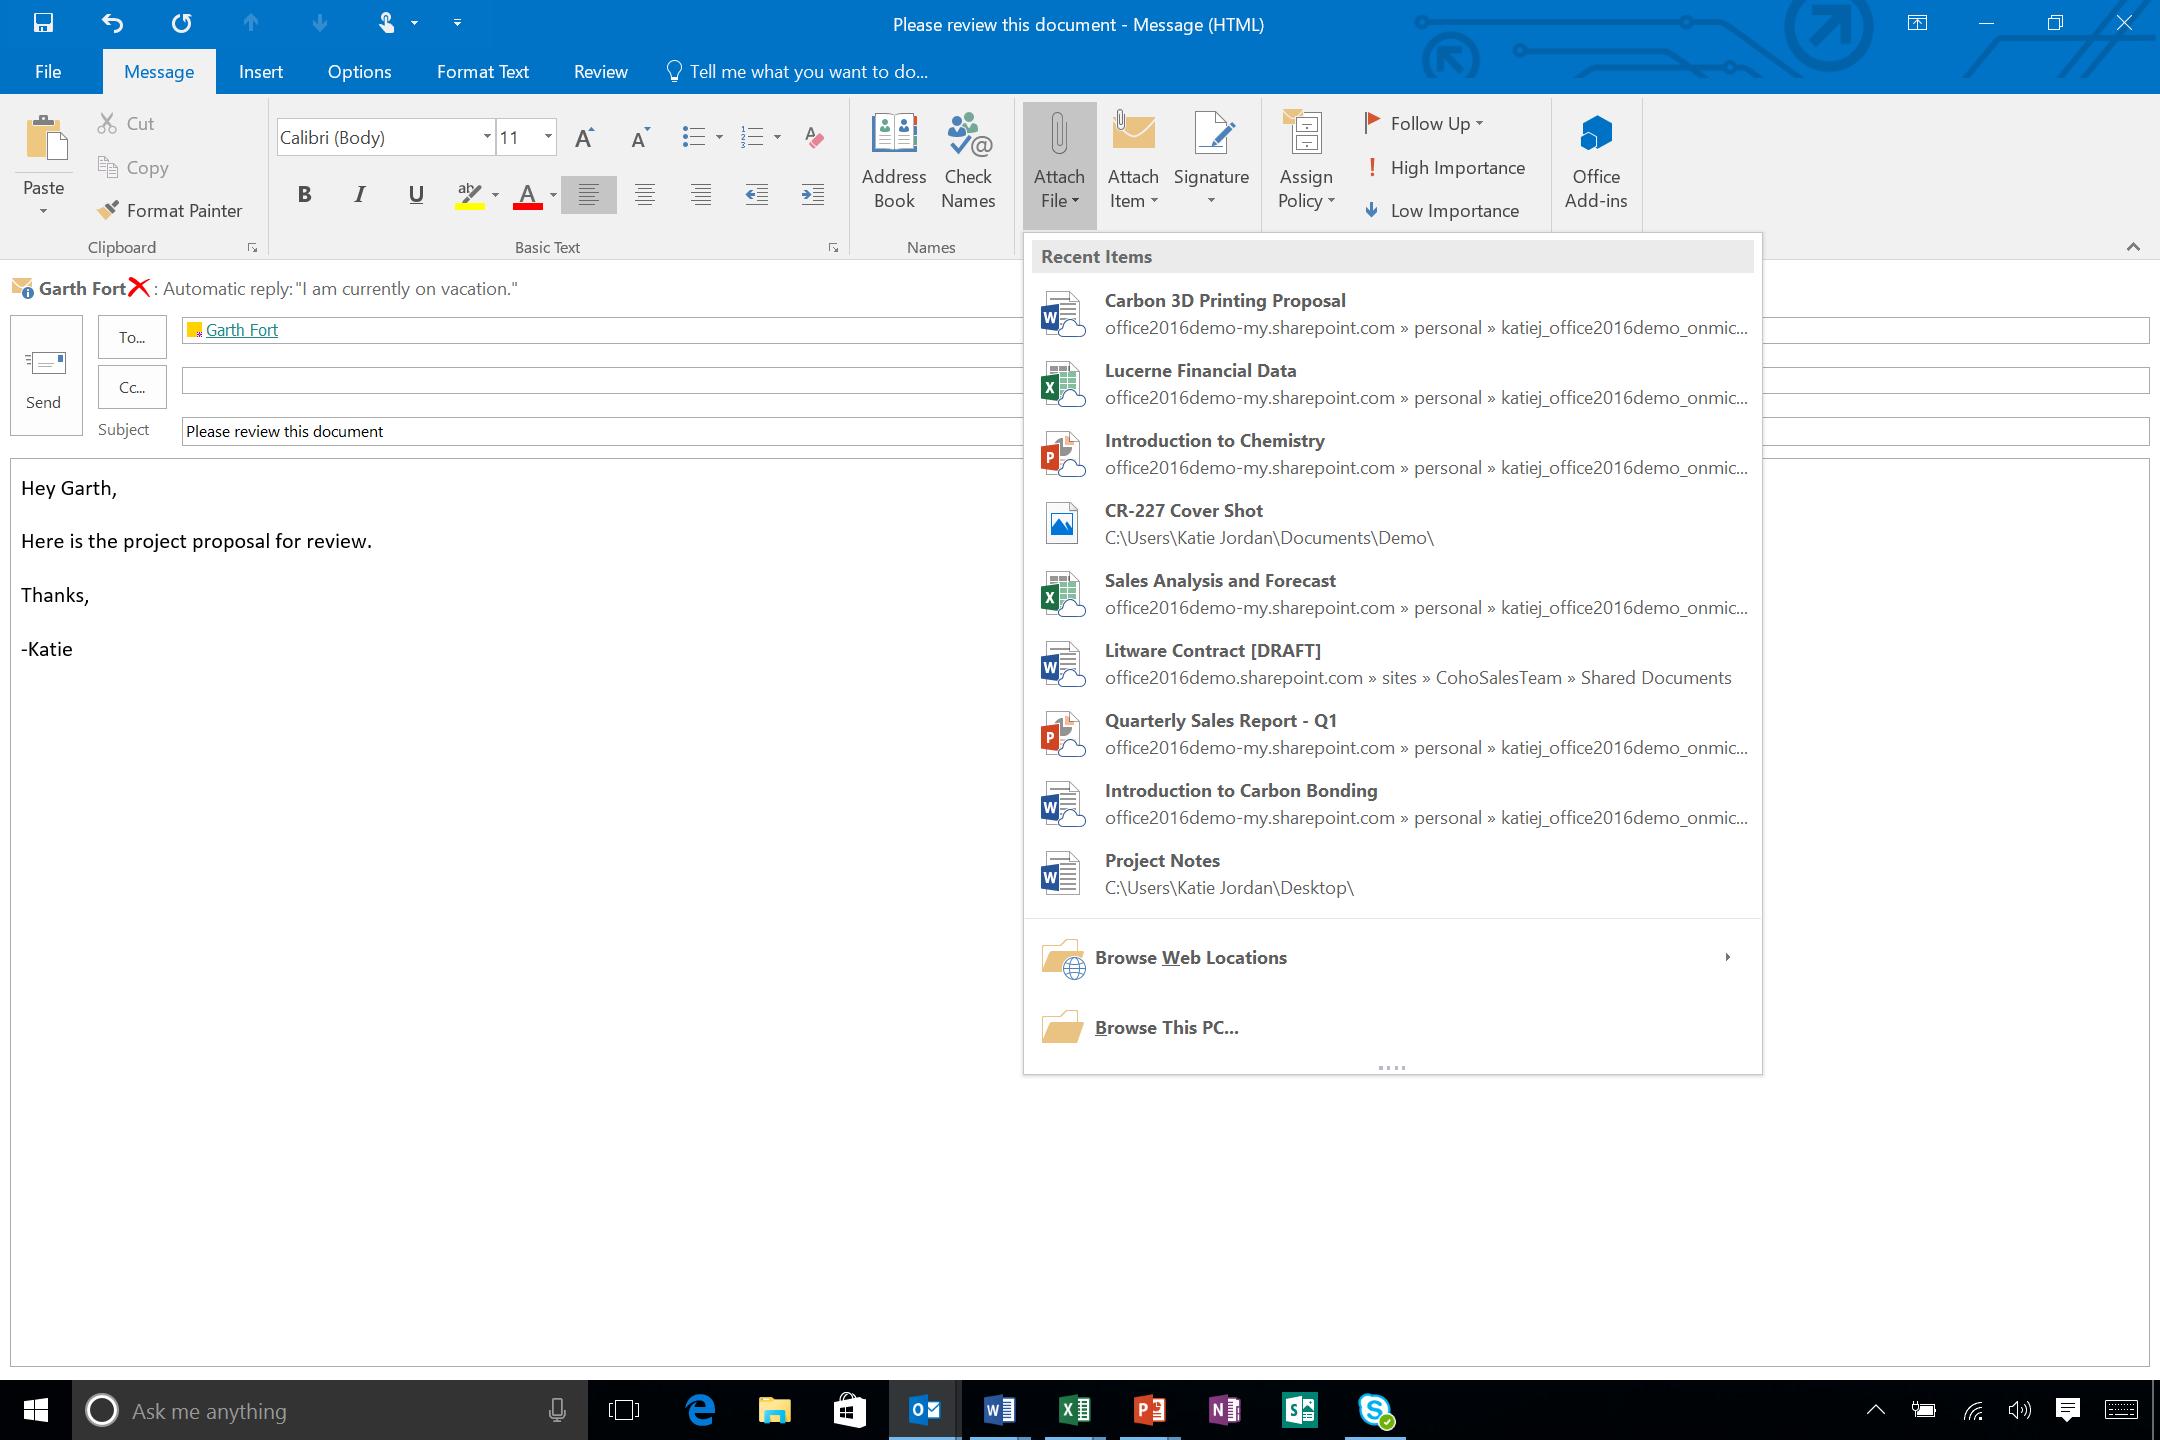 Microsoft Office 2016 Ya Disponible En Espa 241 A Novedades